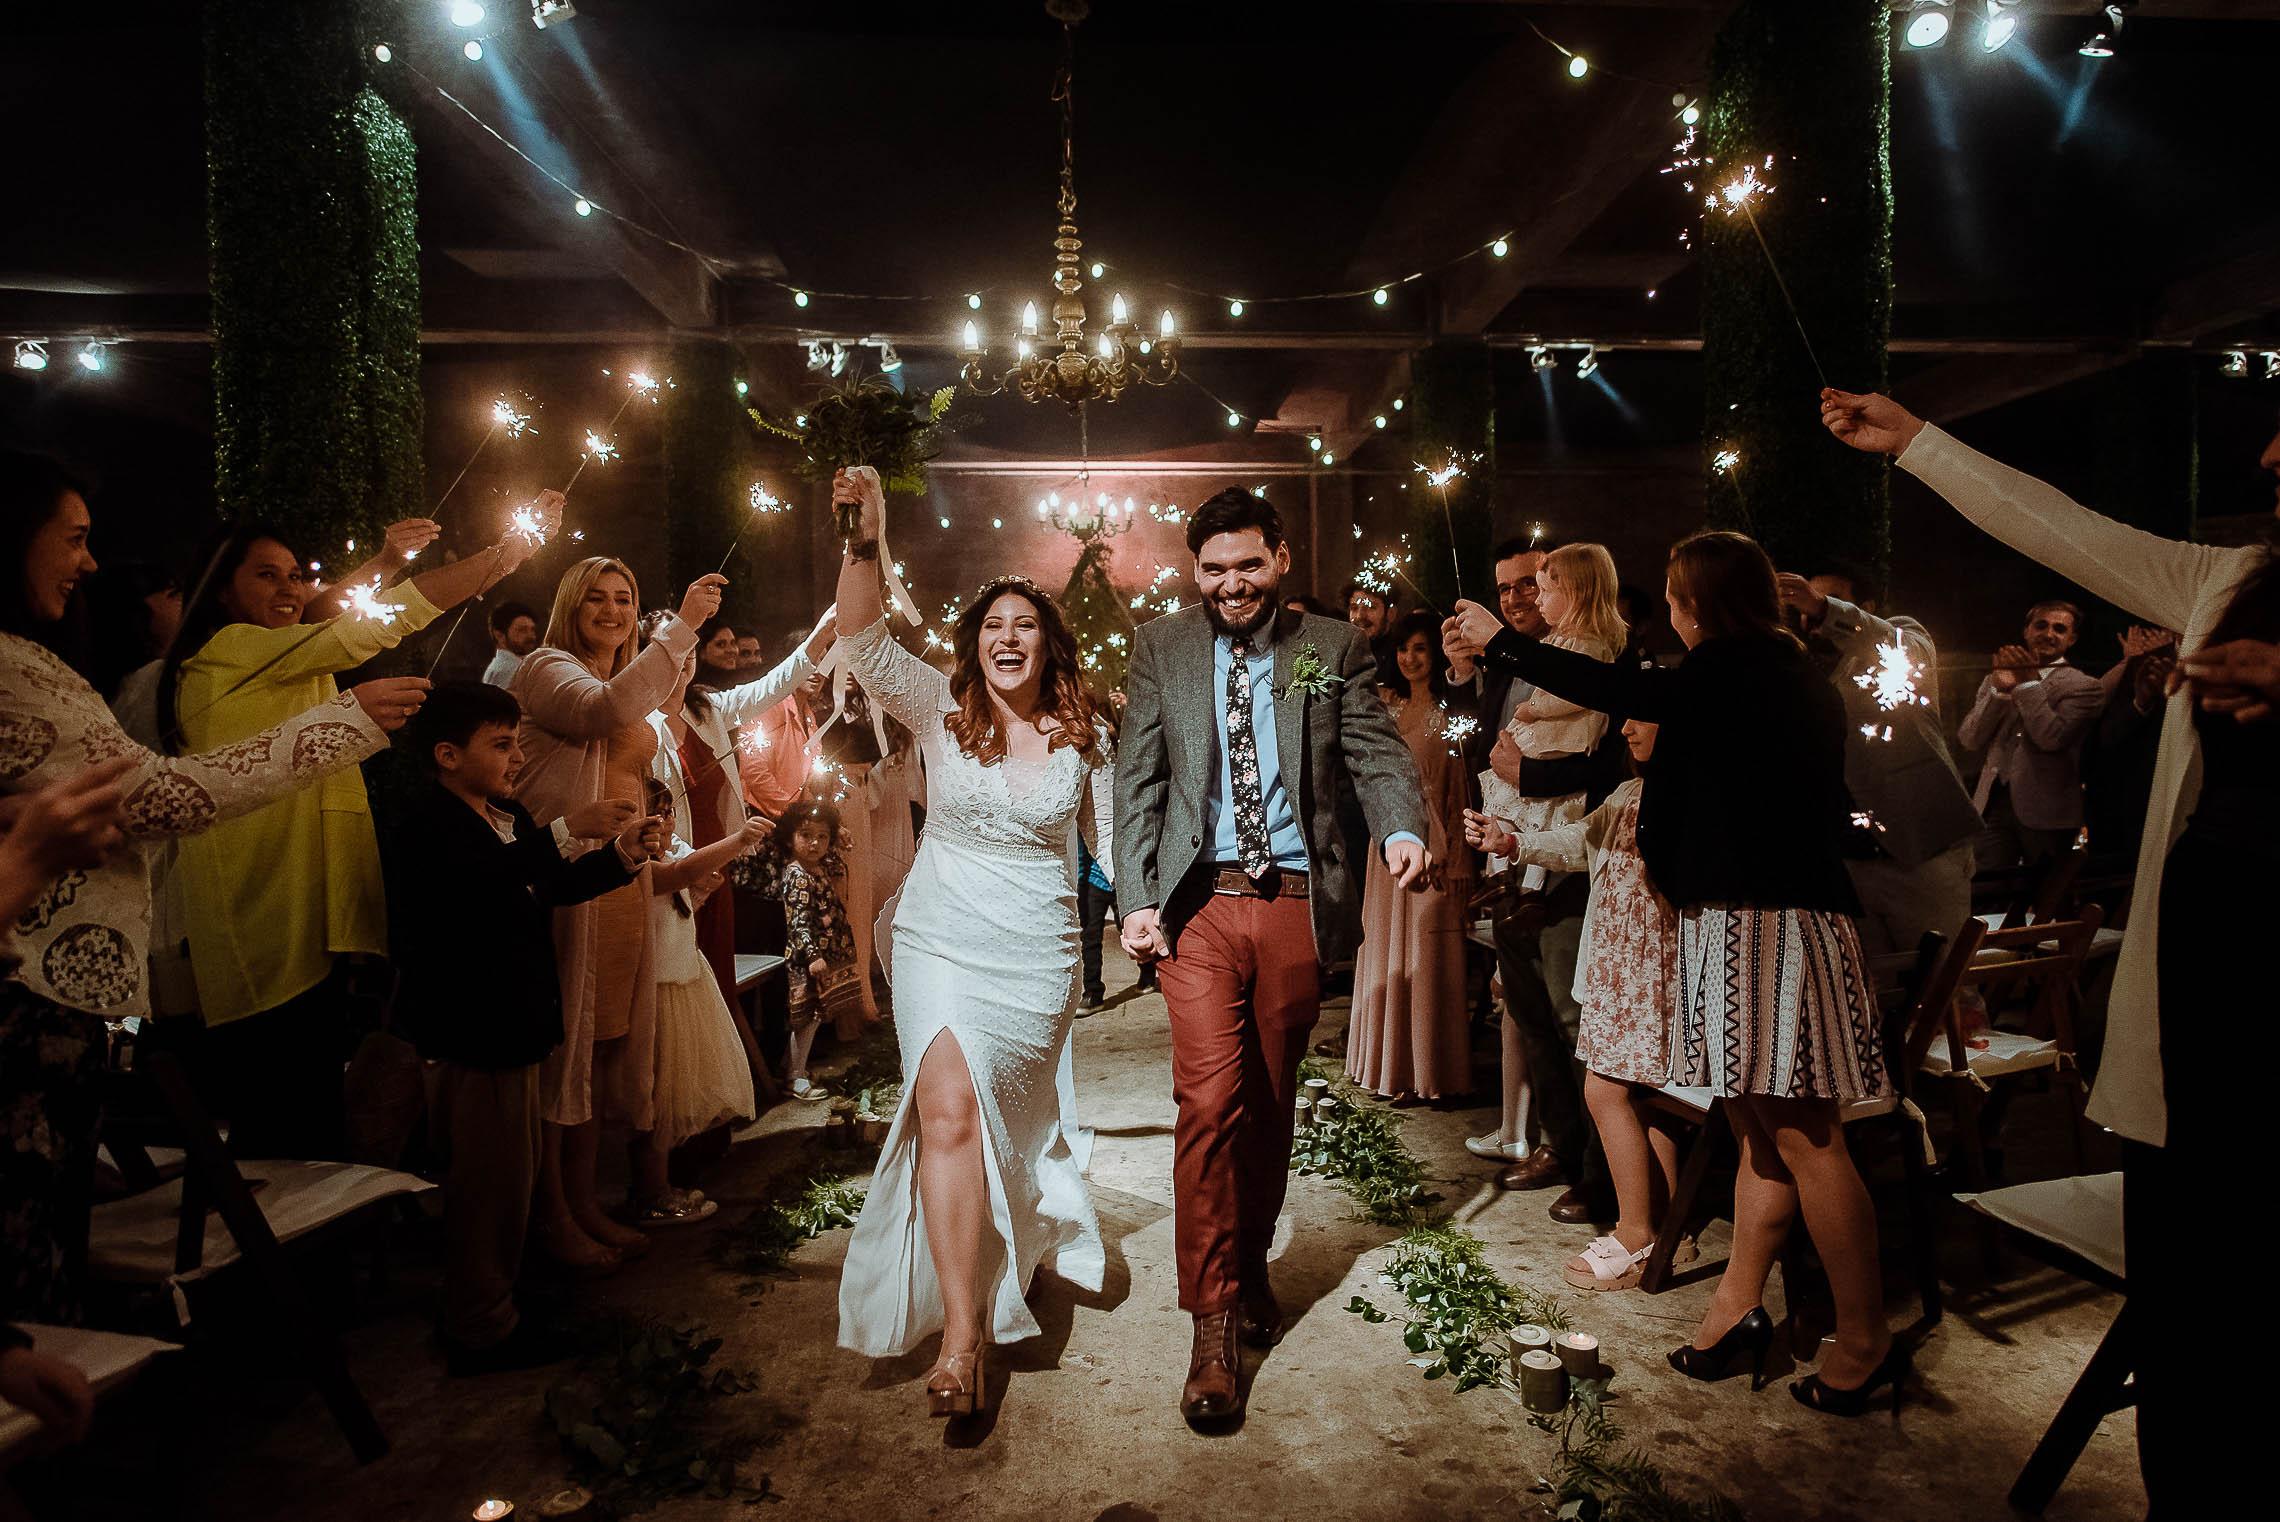 boda-bodega-agricola-jackson-montevideo-jacksonville-fotografia-casamiento-fotografo-uruguay-chile-deborah-dantzoff-ceremonia-simbolica